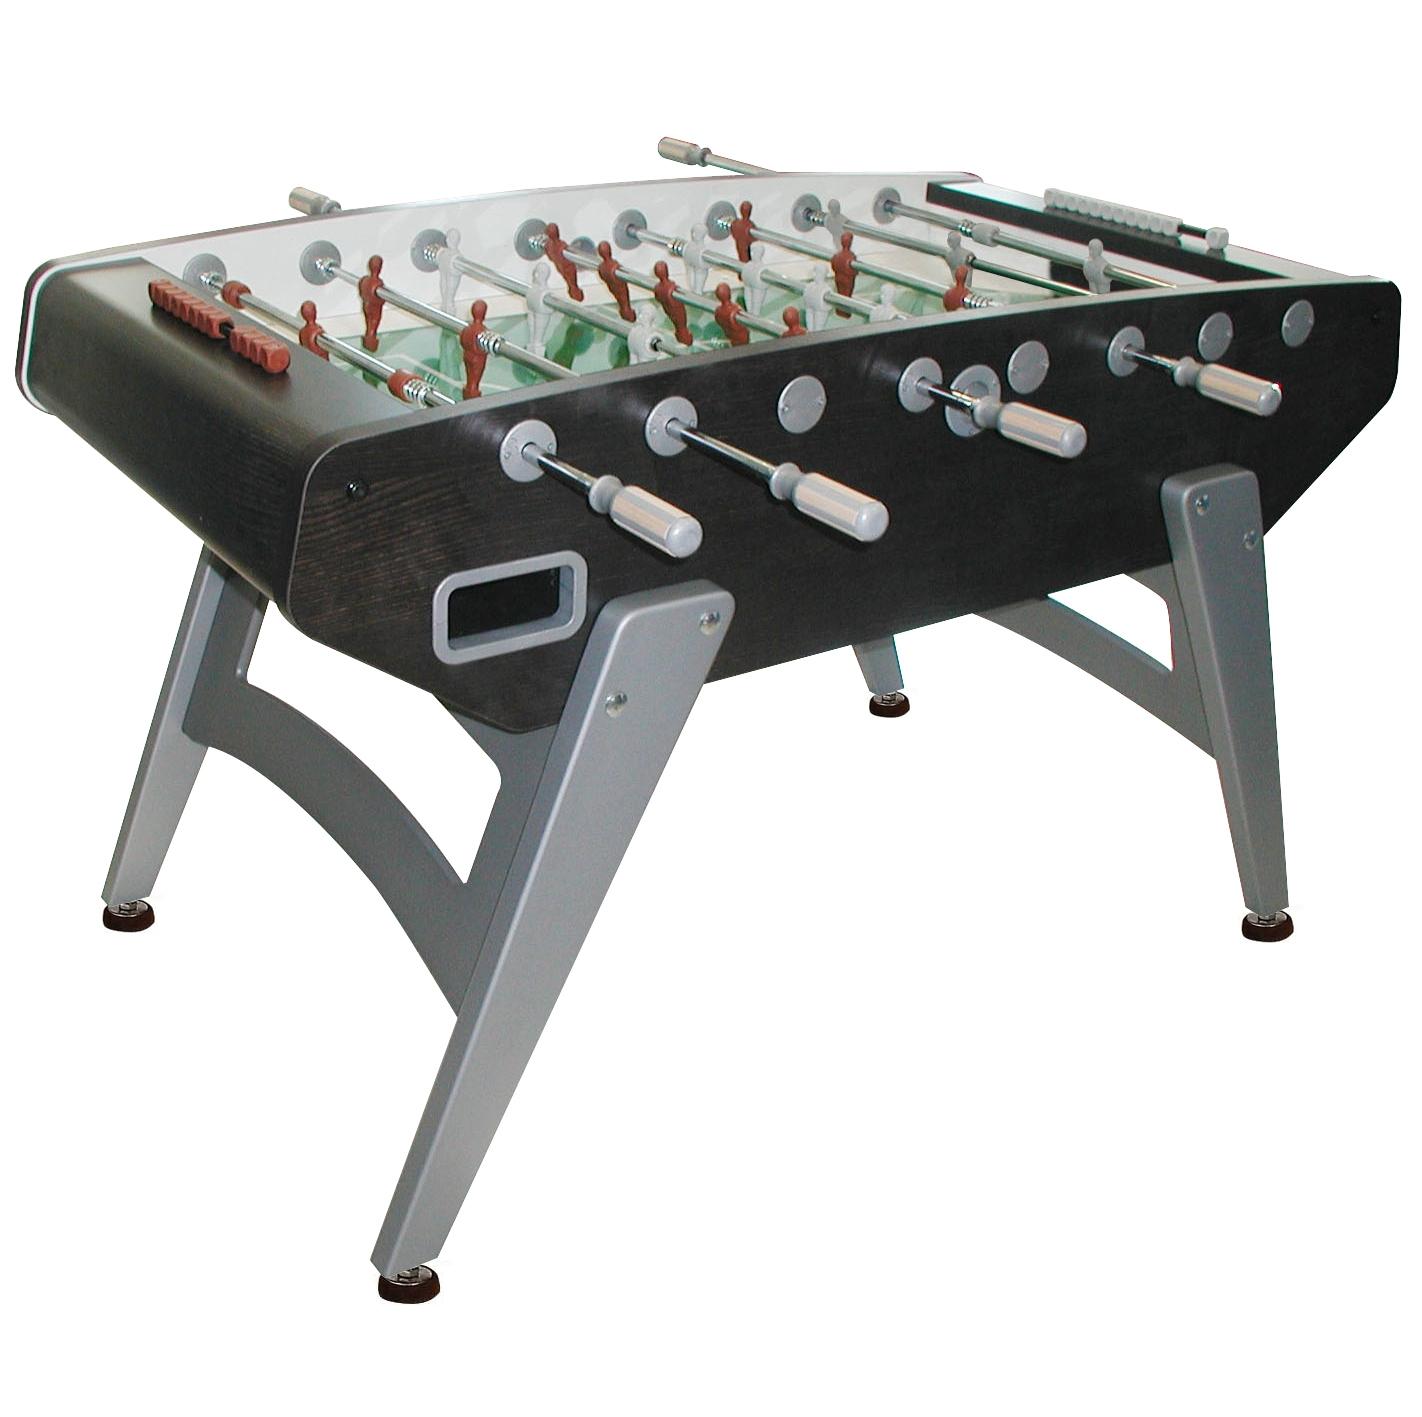 Image of Garlando G-5000 Wenge Football Table